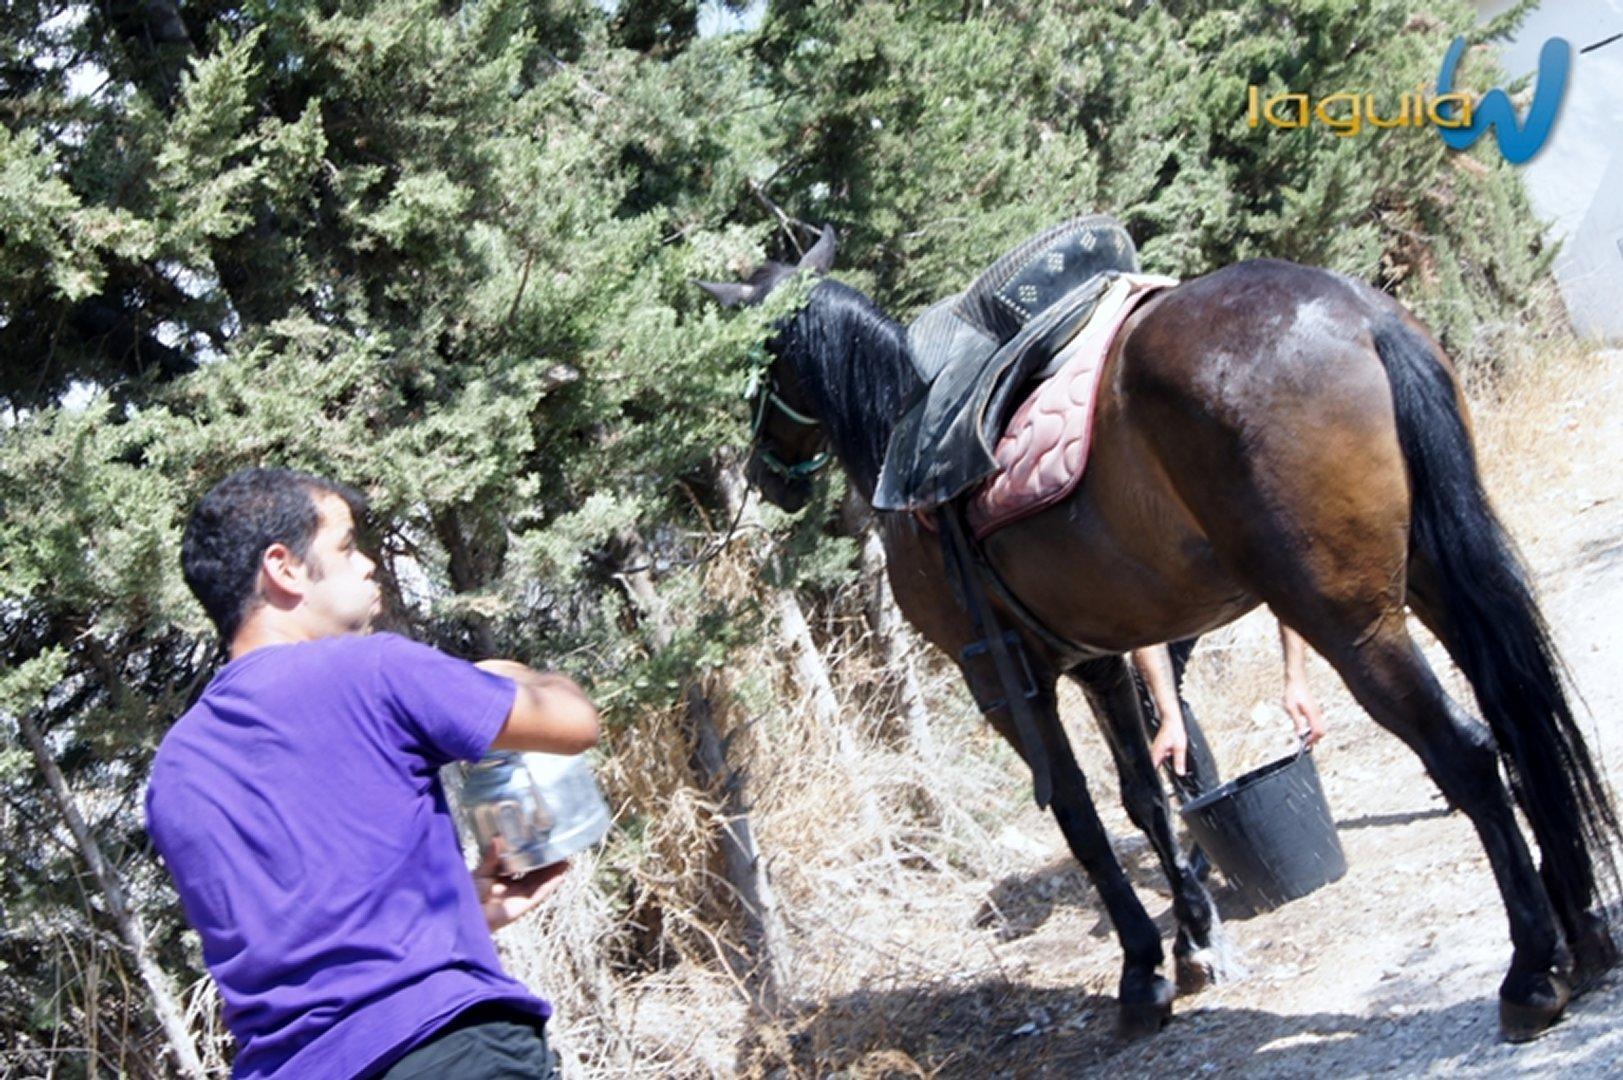 Romeria rociera 2012 archena - En transito